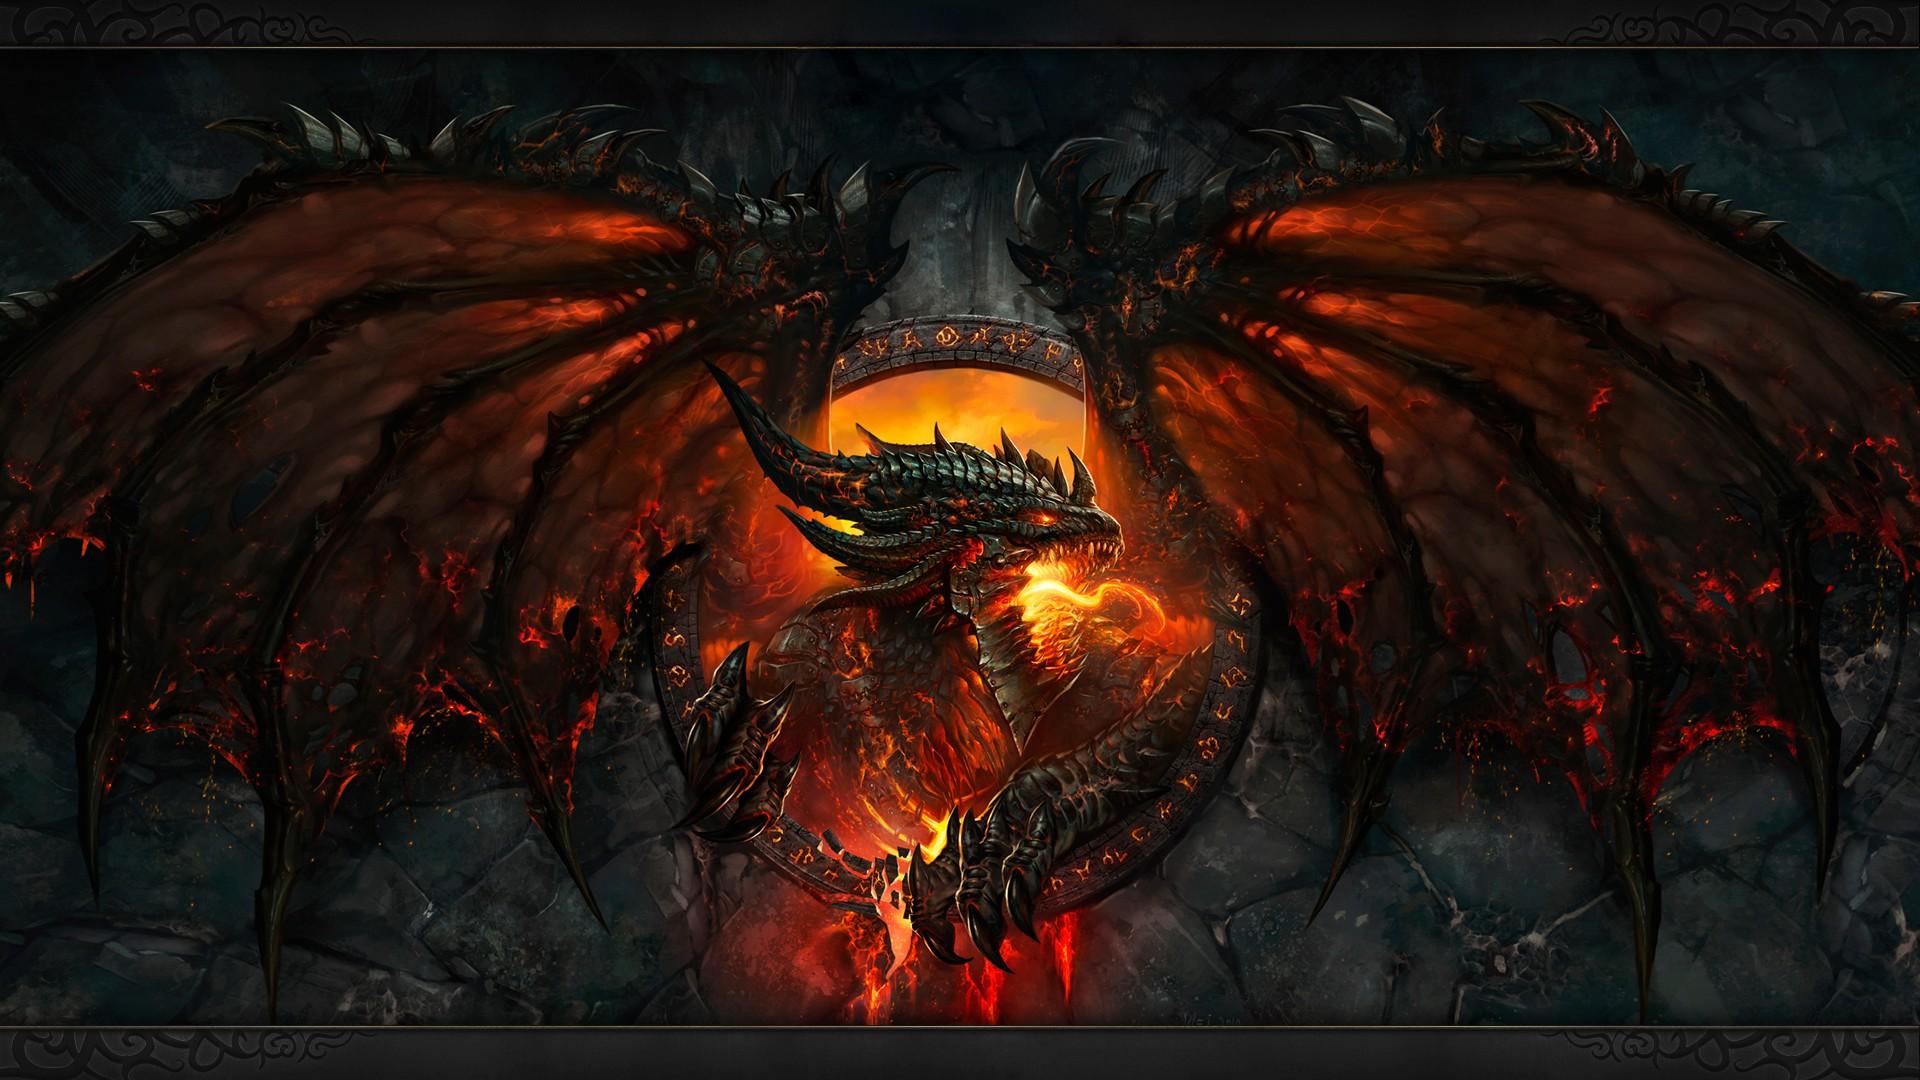 Fantasy Wallpapers 1920x1080: Dragon Wallpaper 1920x1080 ·① Download Free Cool